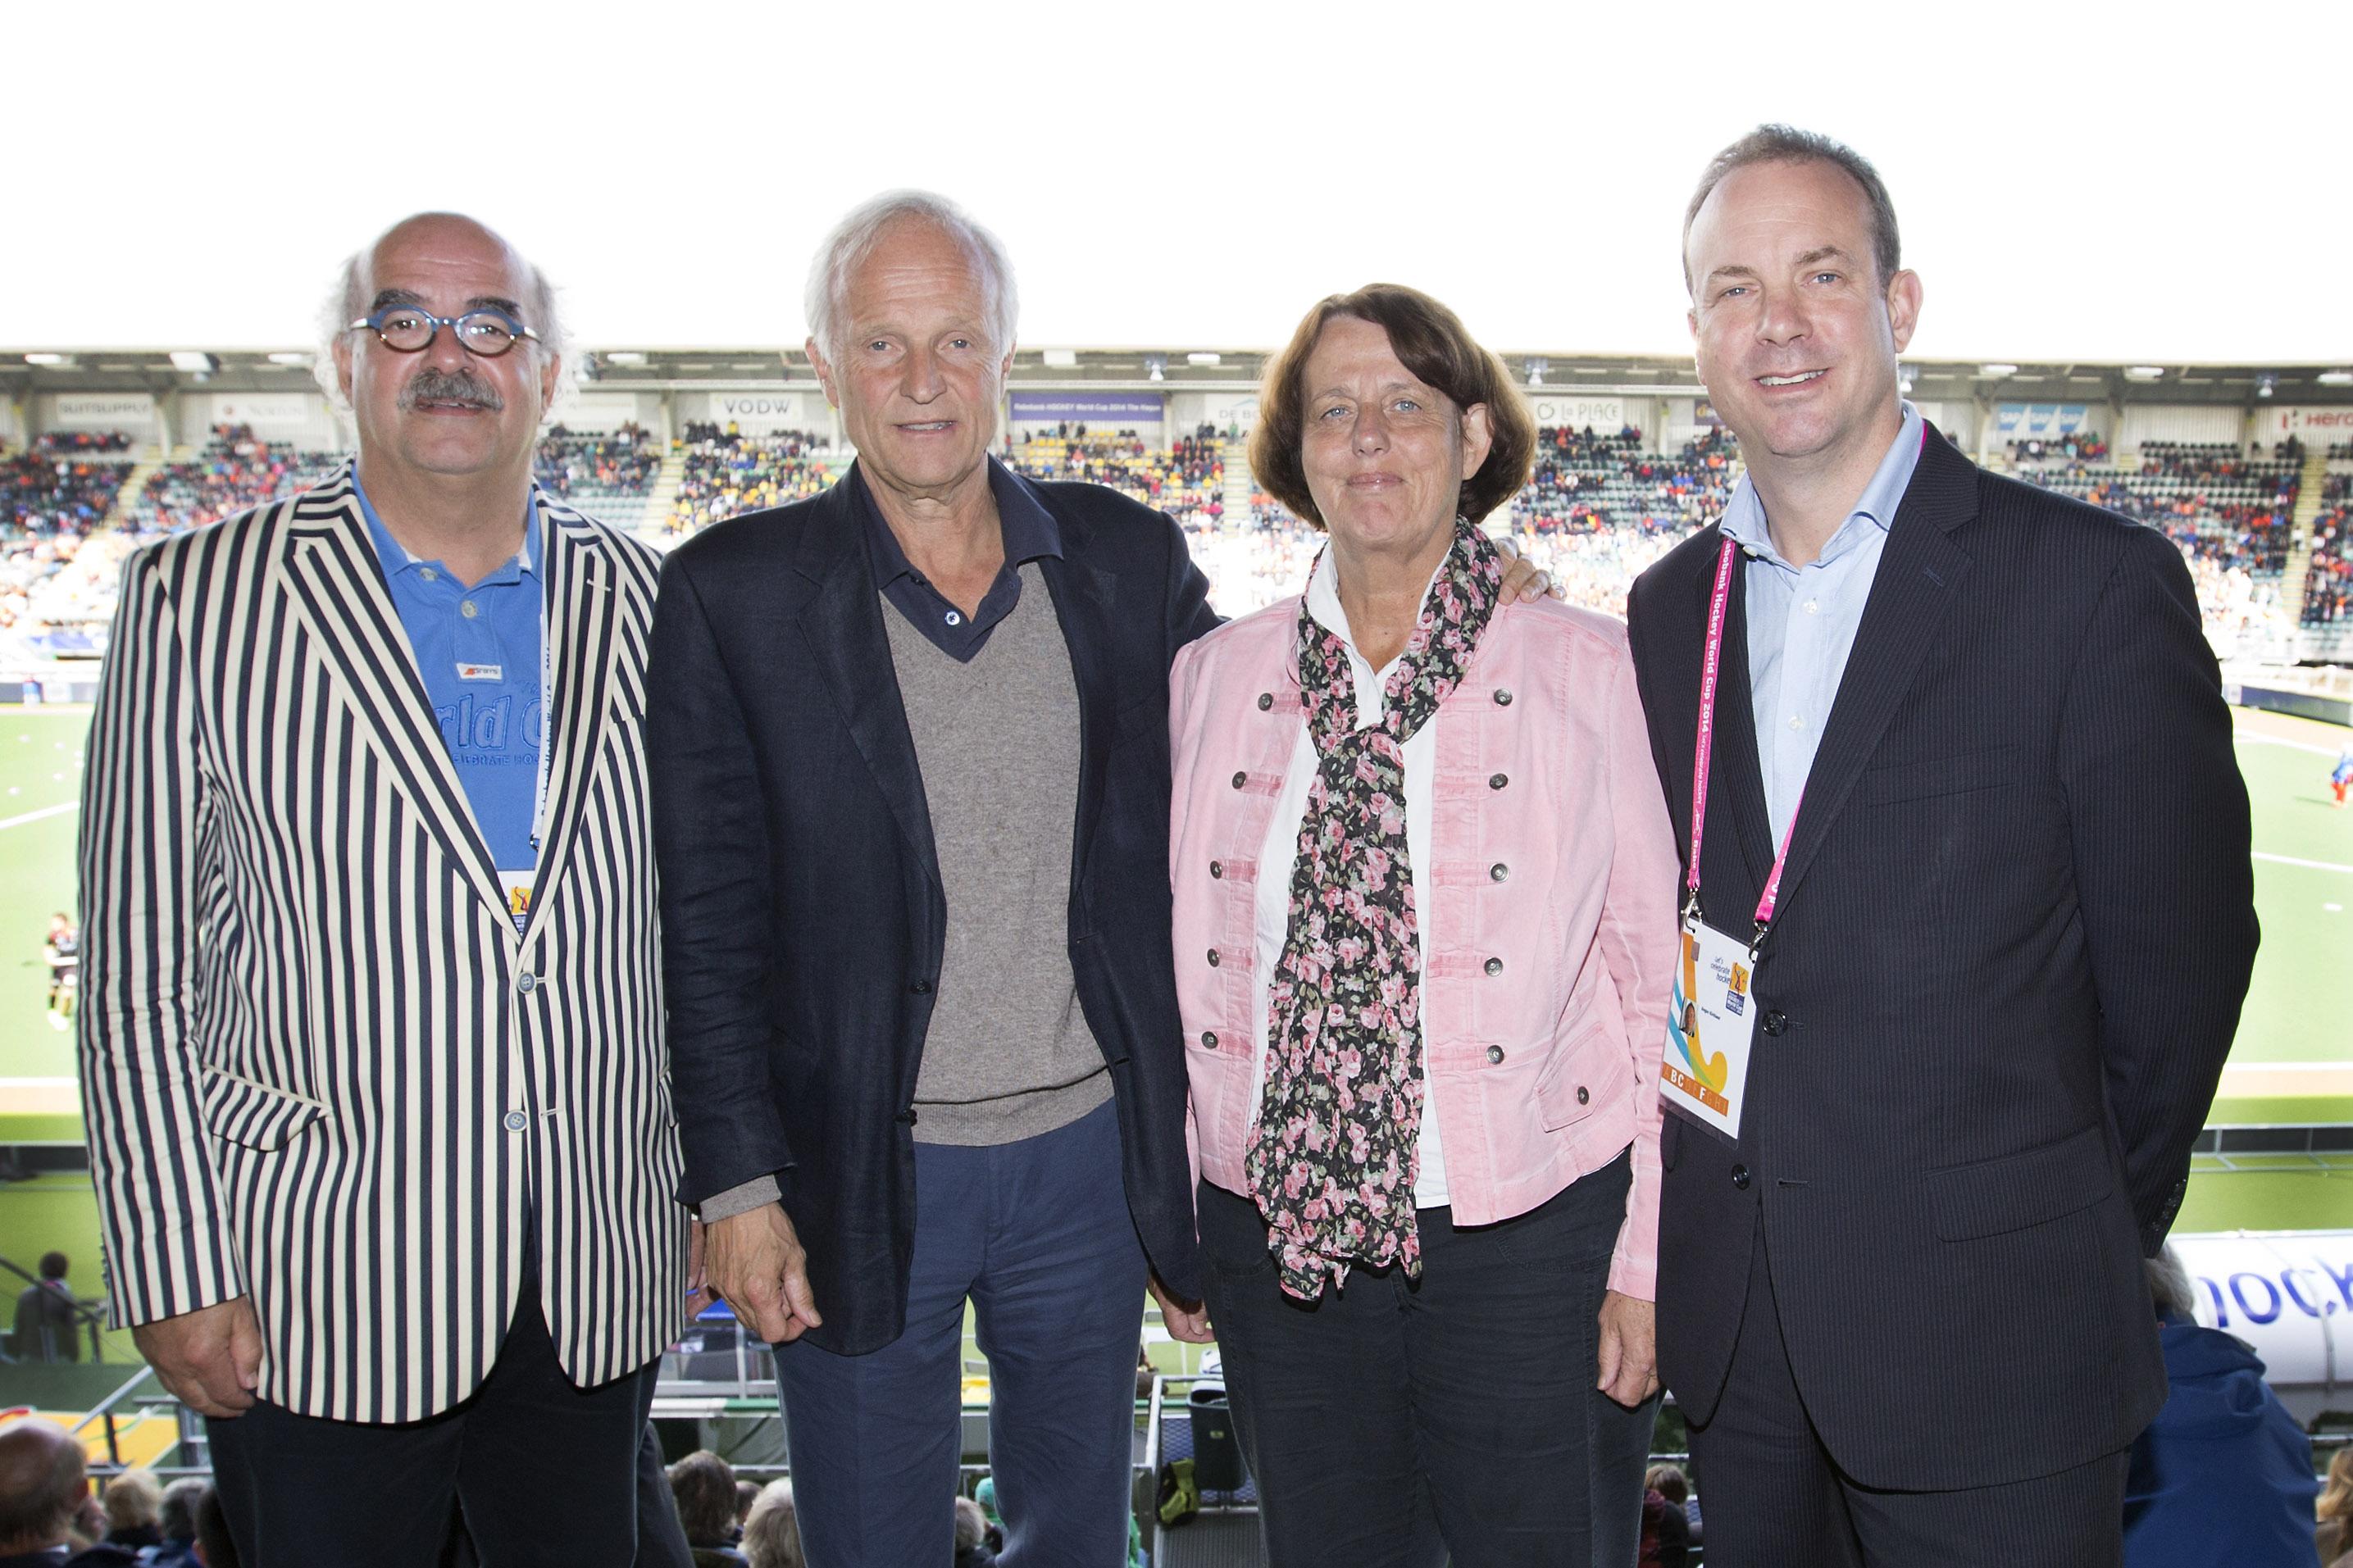 (l-r) Johan Wakkie and Jan Albers (EHB), Marijke Fleuren and Angus Kirkland (EHF)